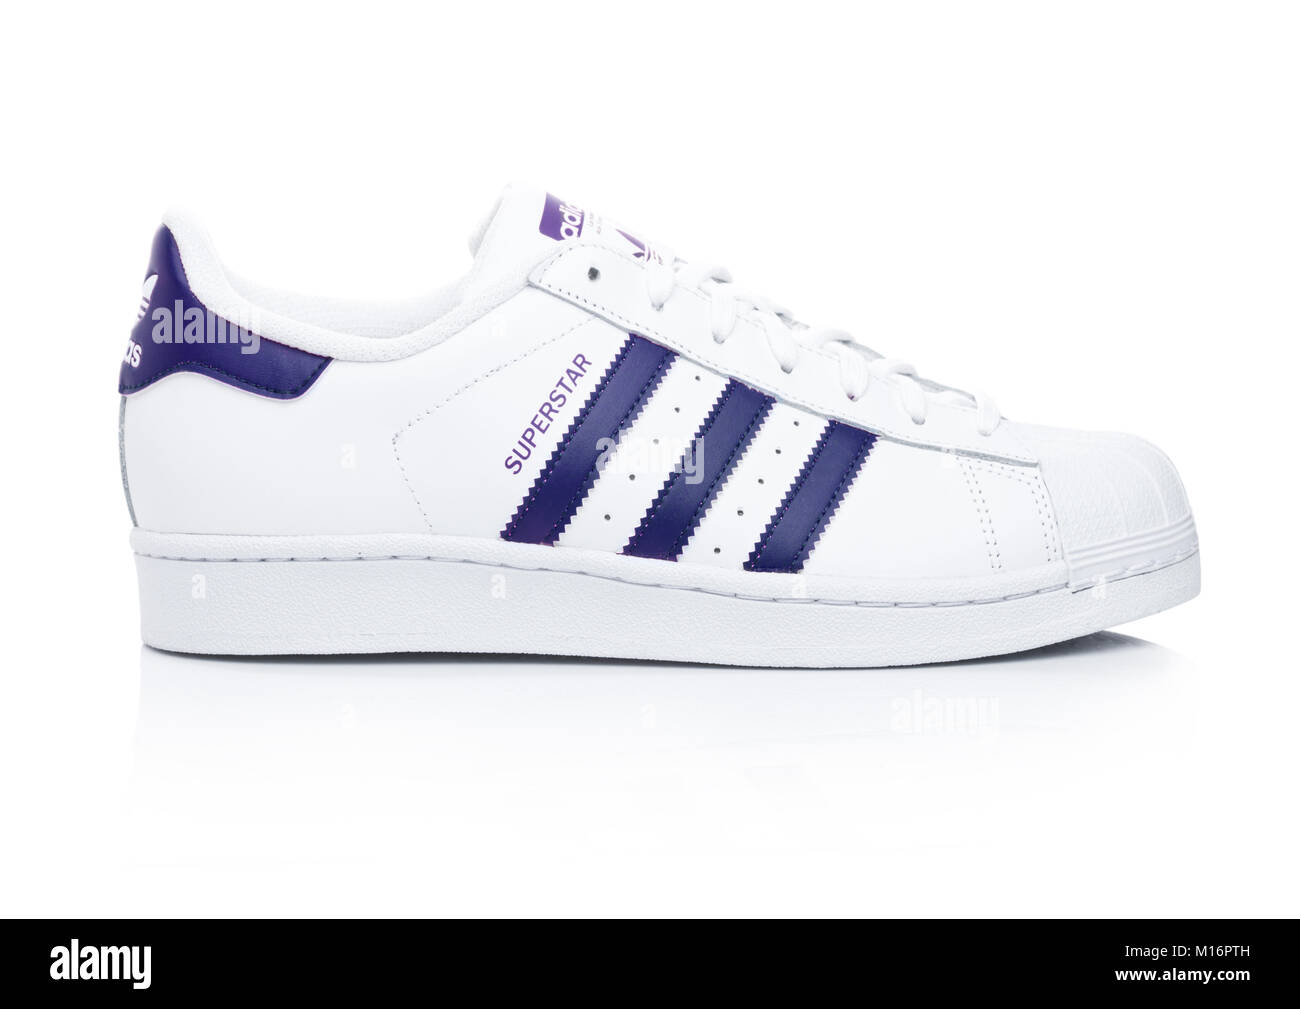 adidas schoenen londen